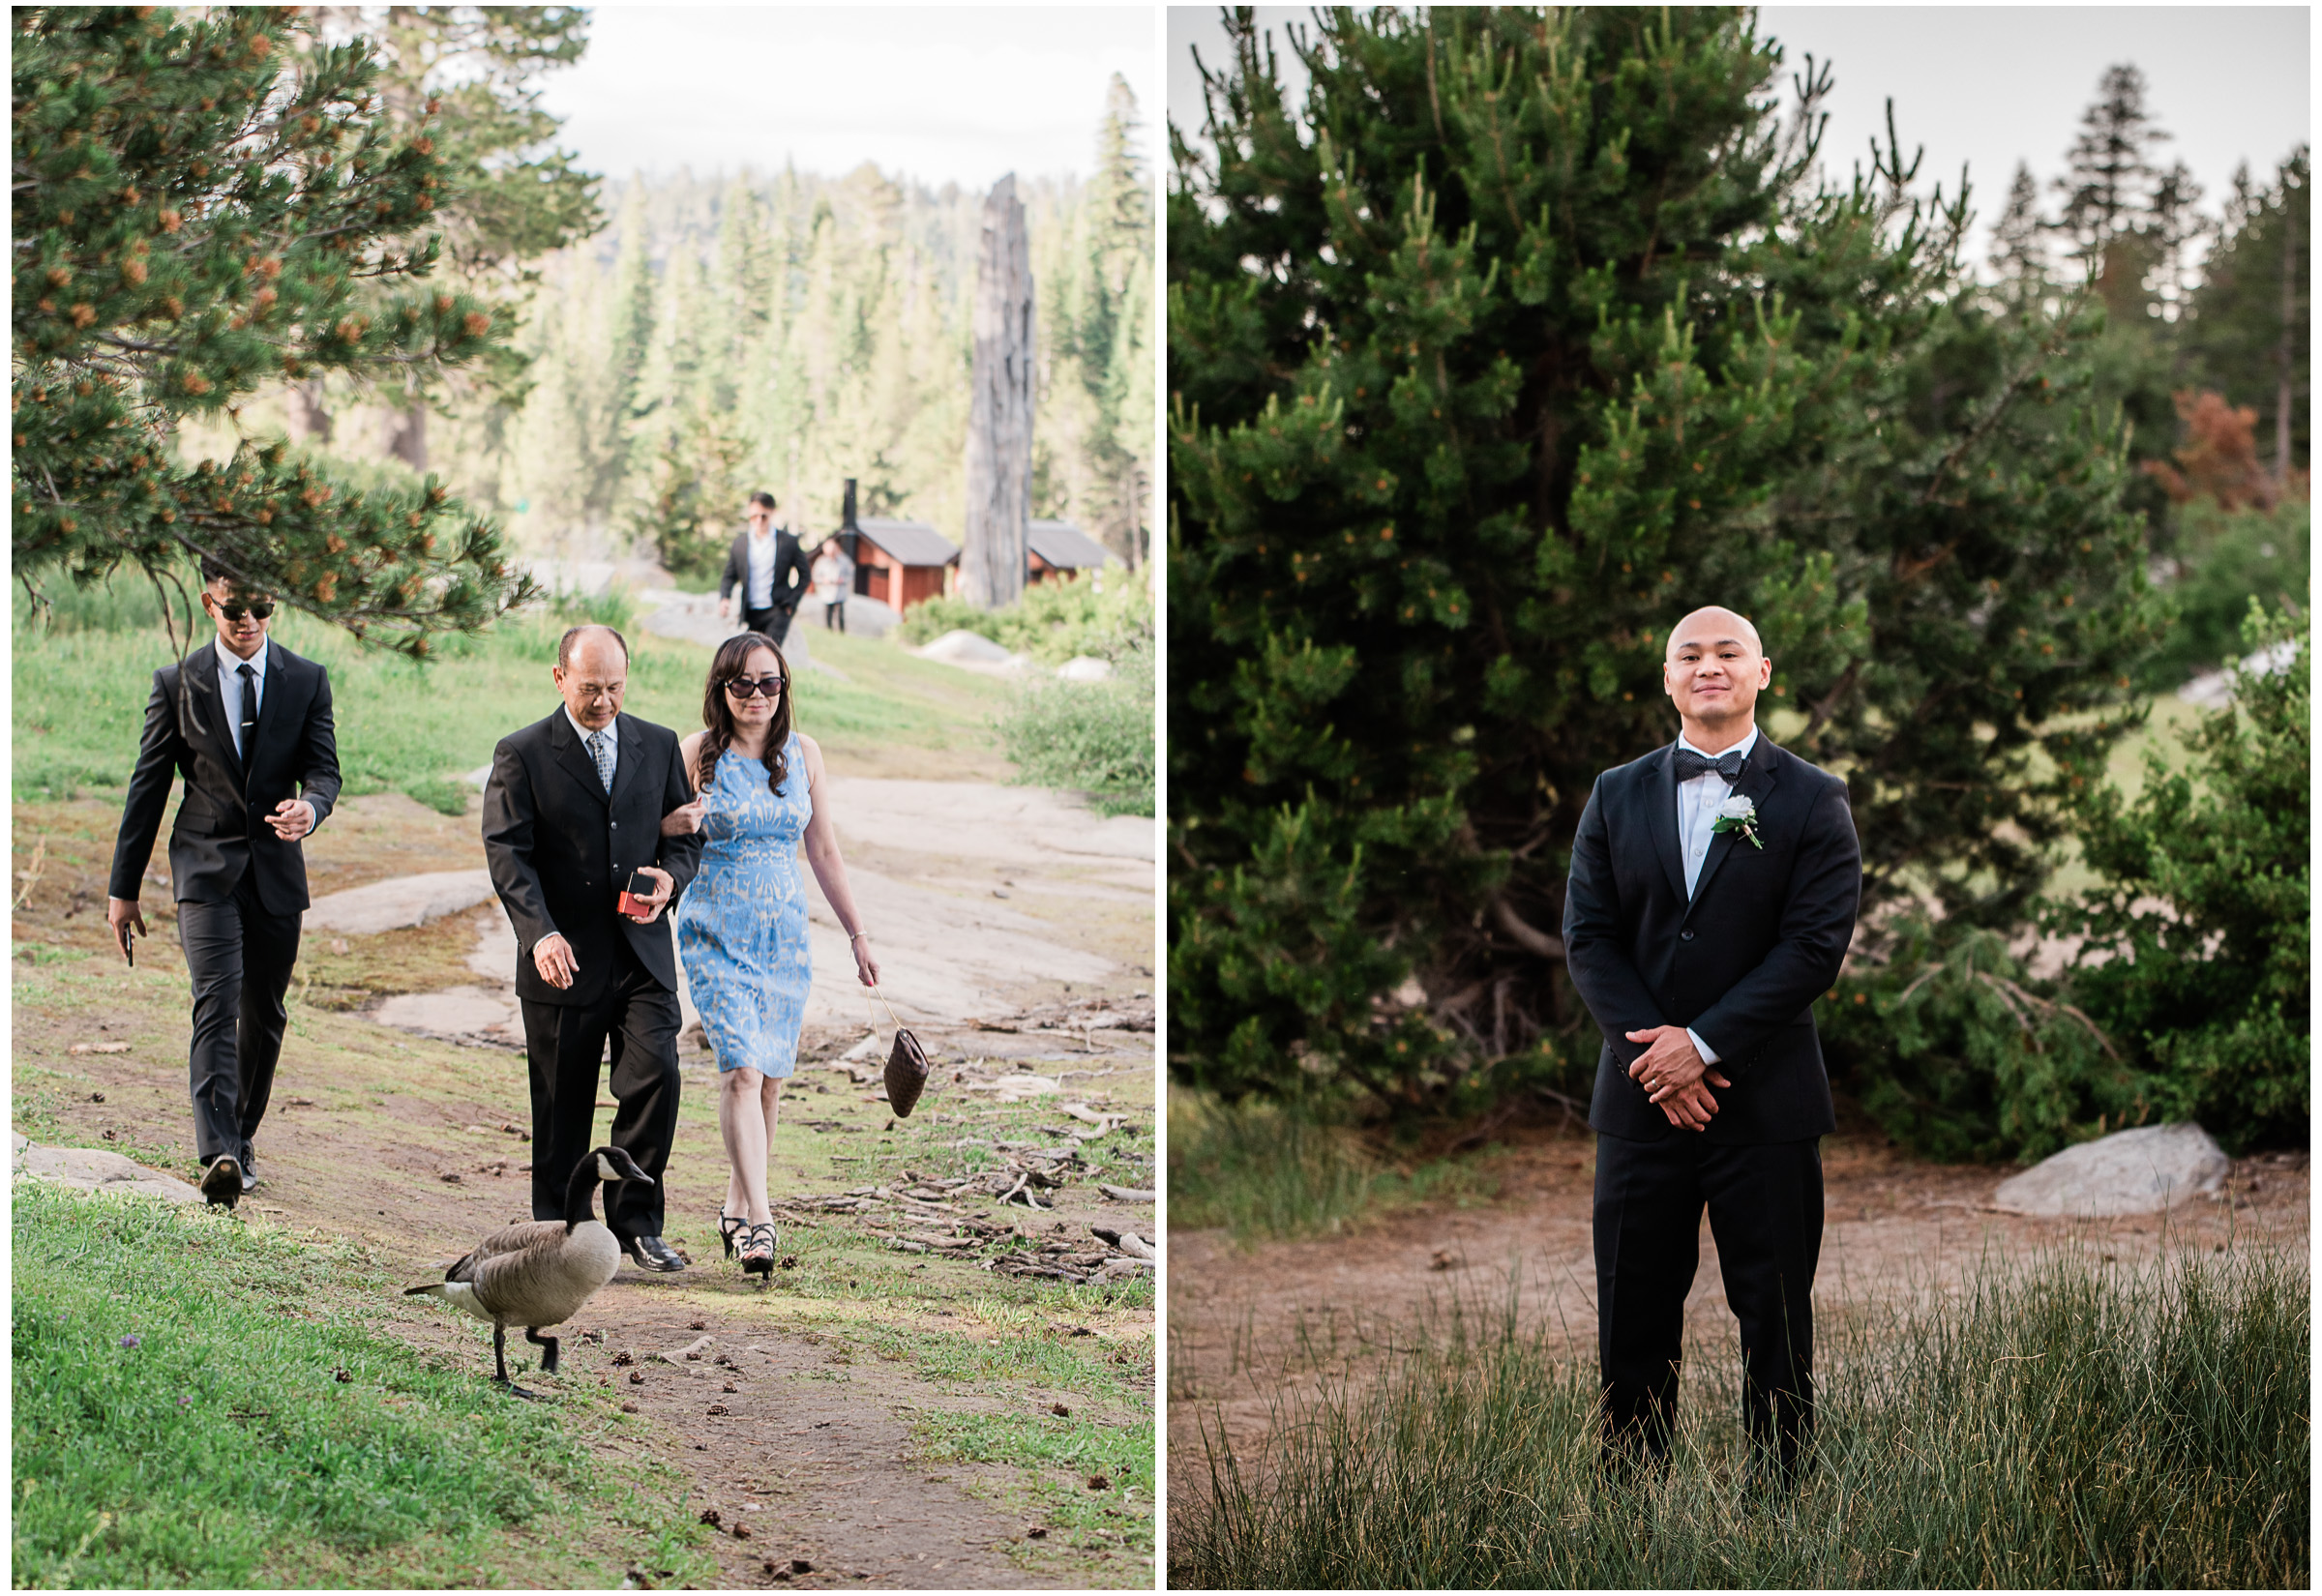 Clarksburg Wedding - Sacramento Photographer - Bogle Winery - Justin Wilcox Photography - 3.jpg